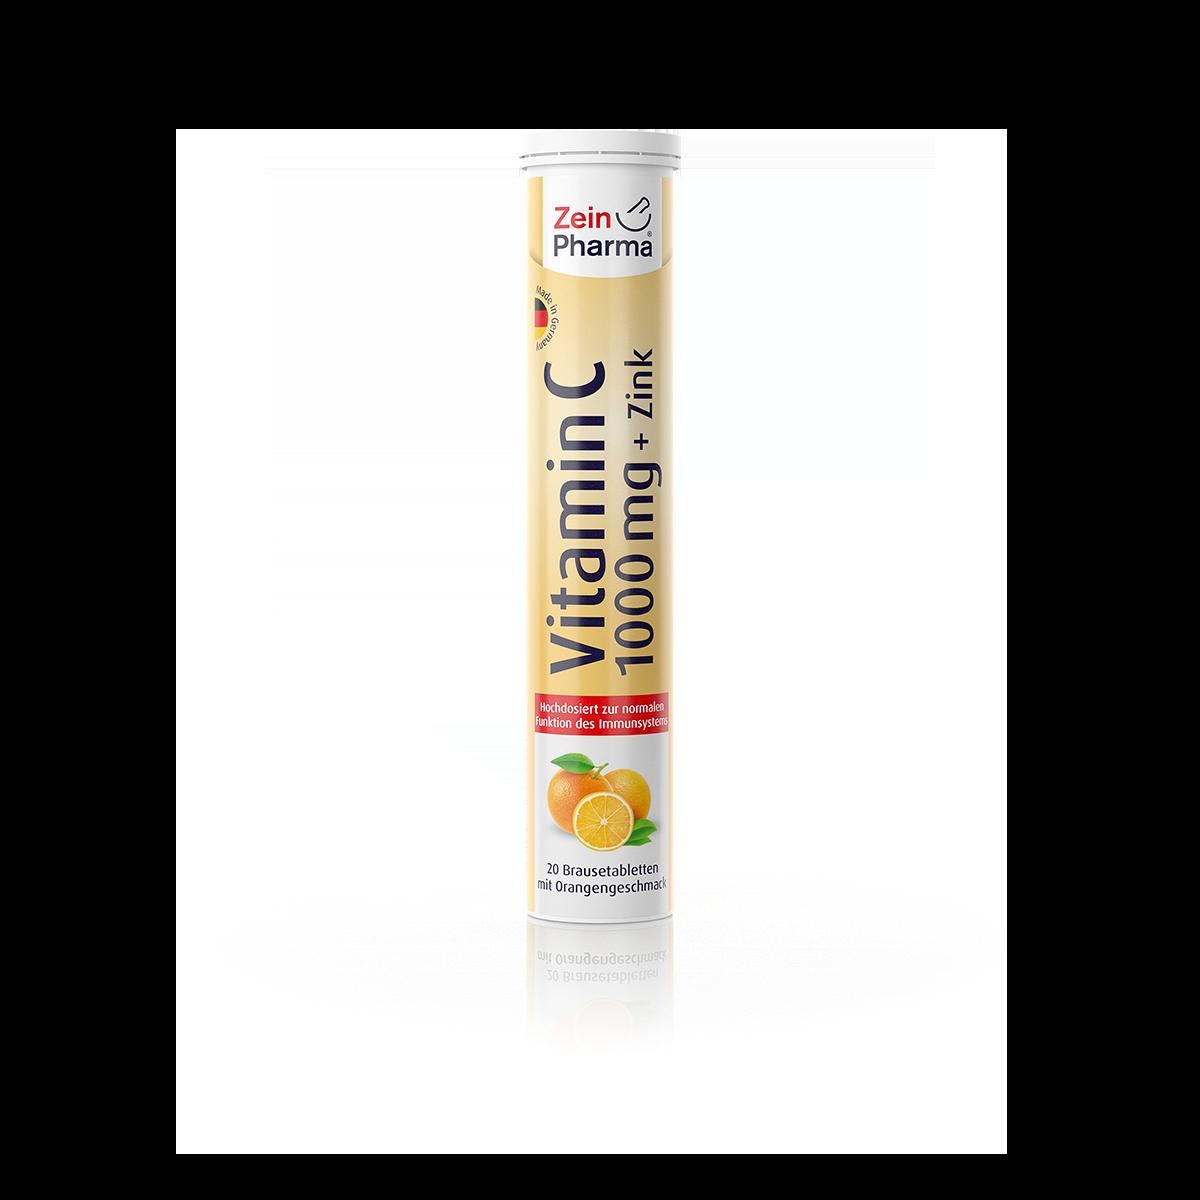 Vitamin C 1000 mg Brausetabletten 20 Stk.